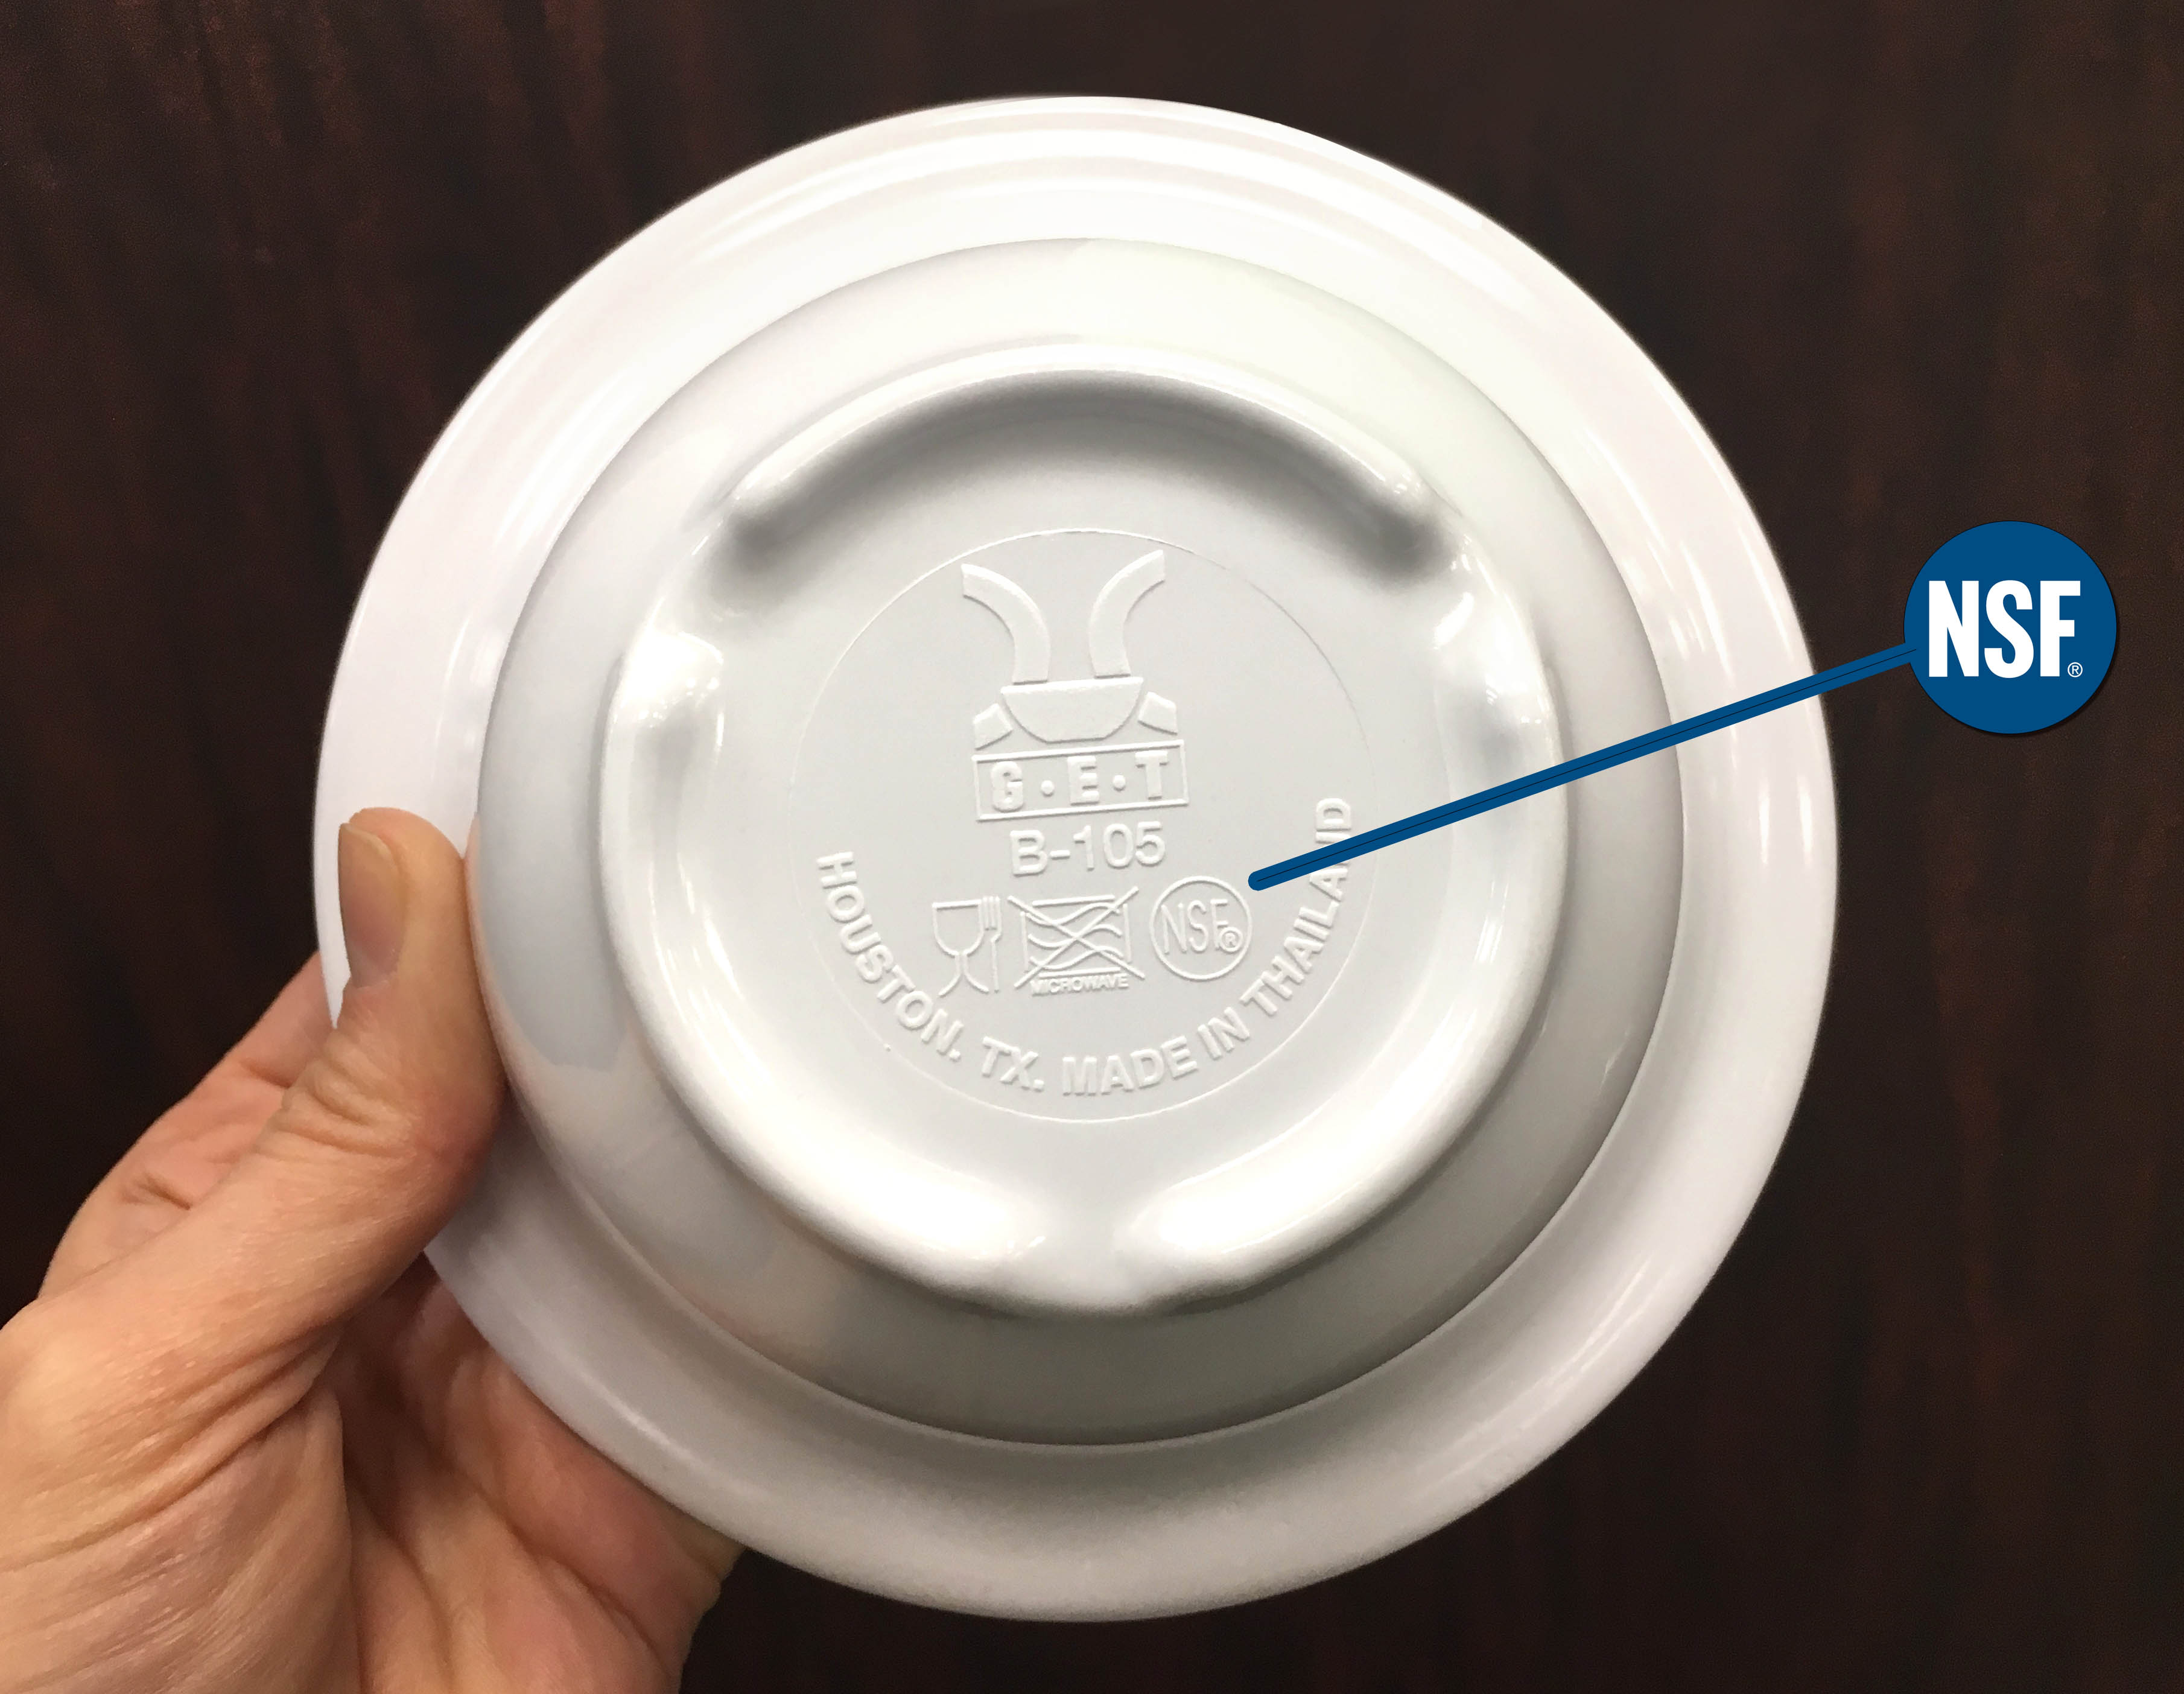 GET-bowl-with-NSF-logo.jpg